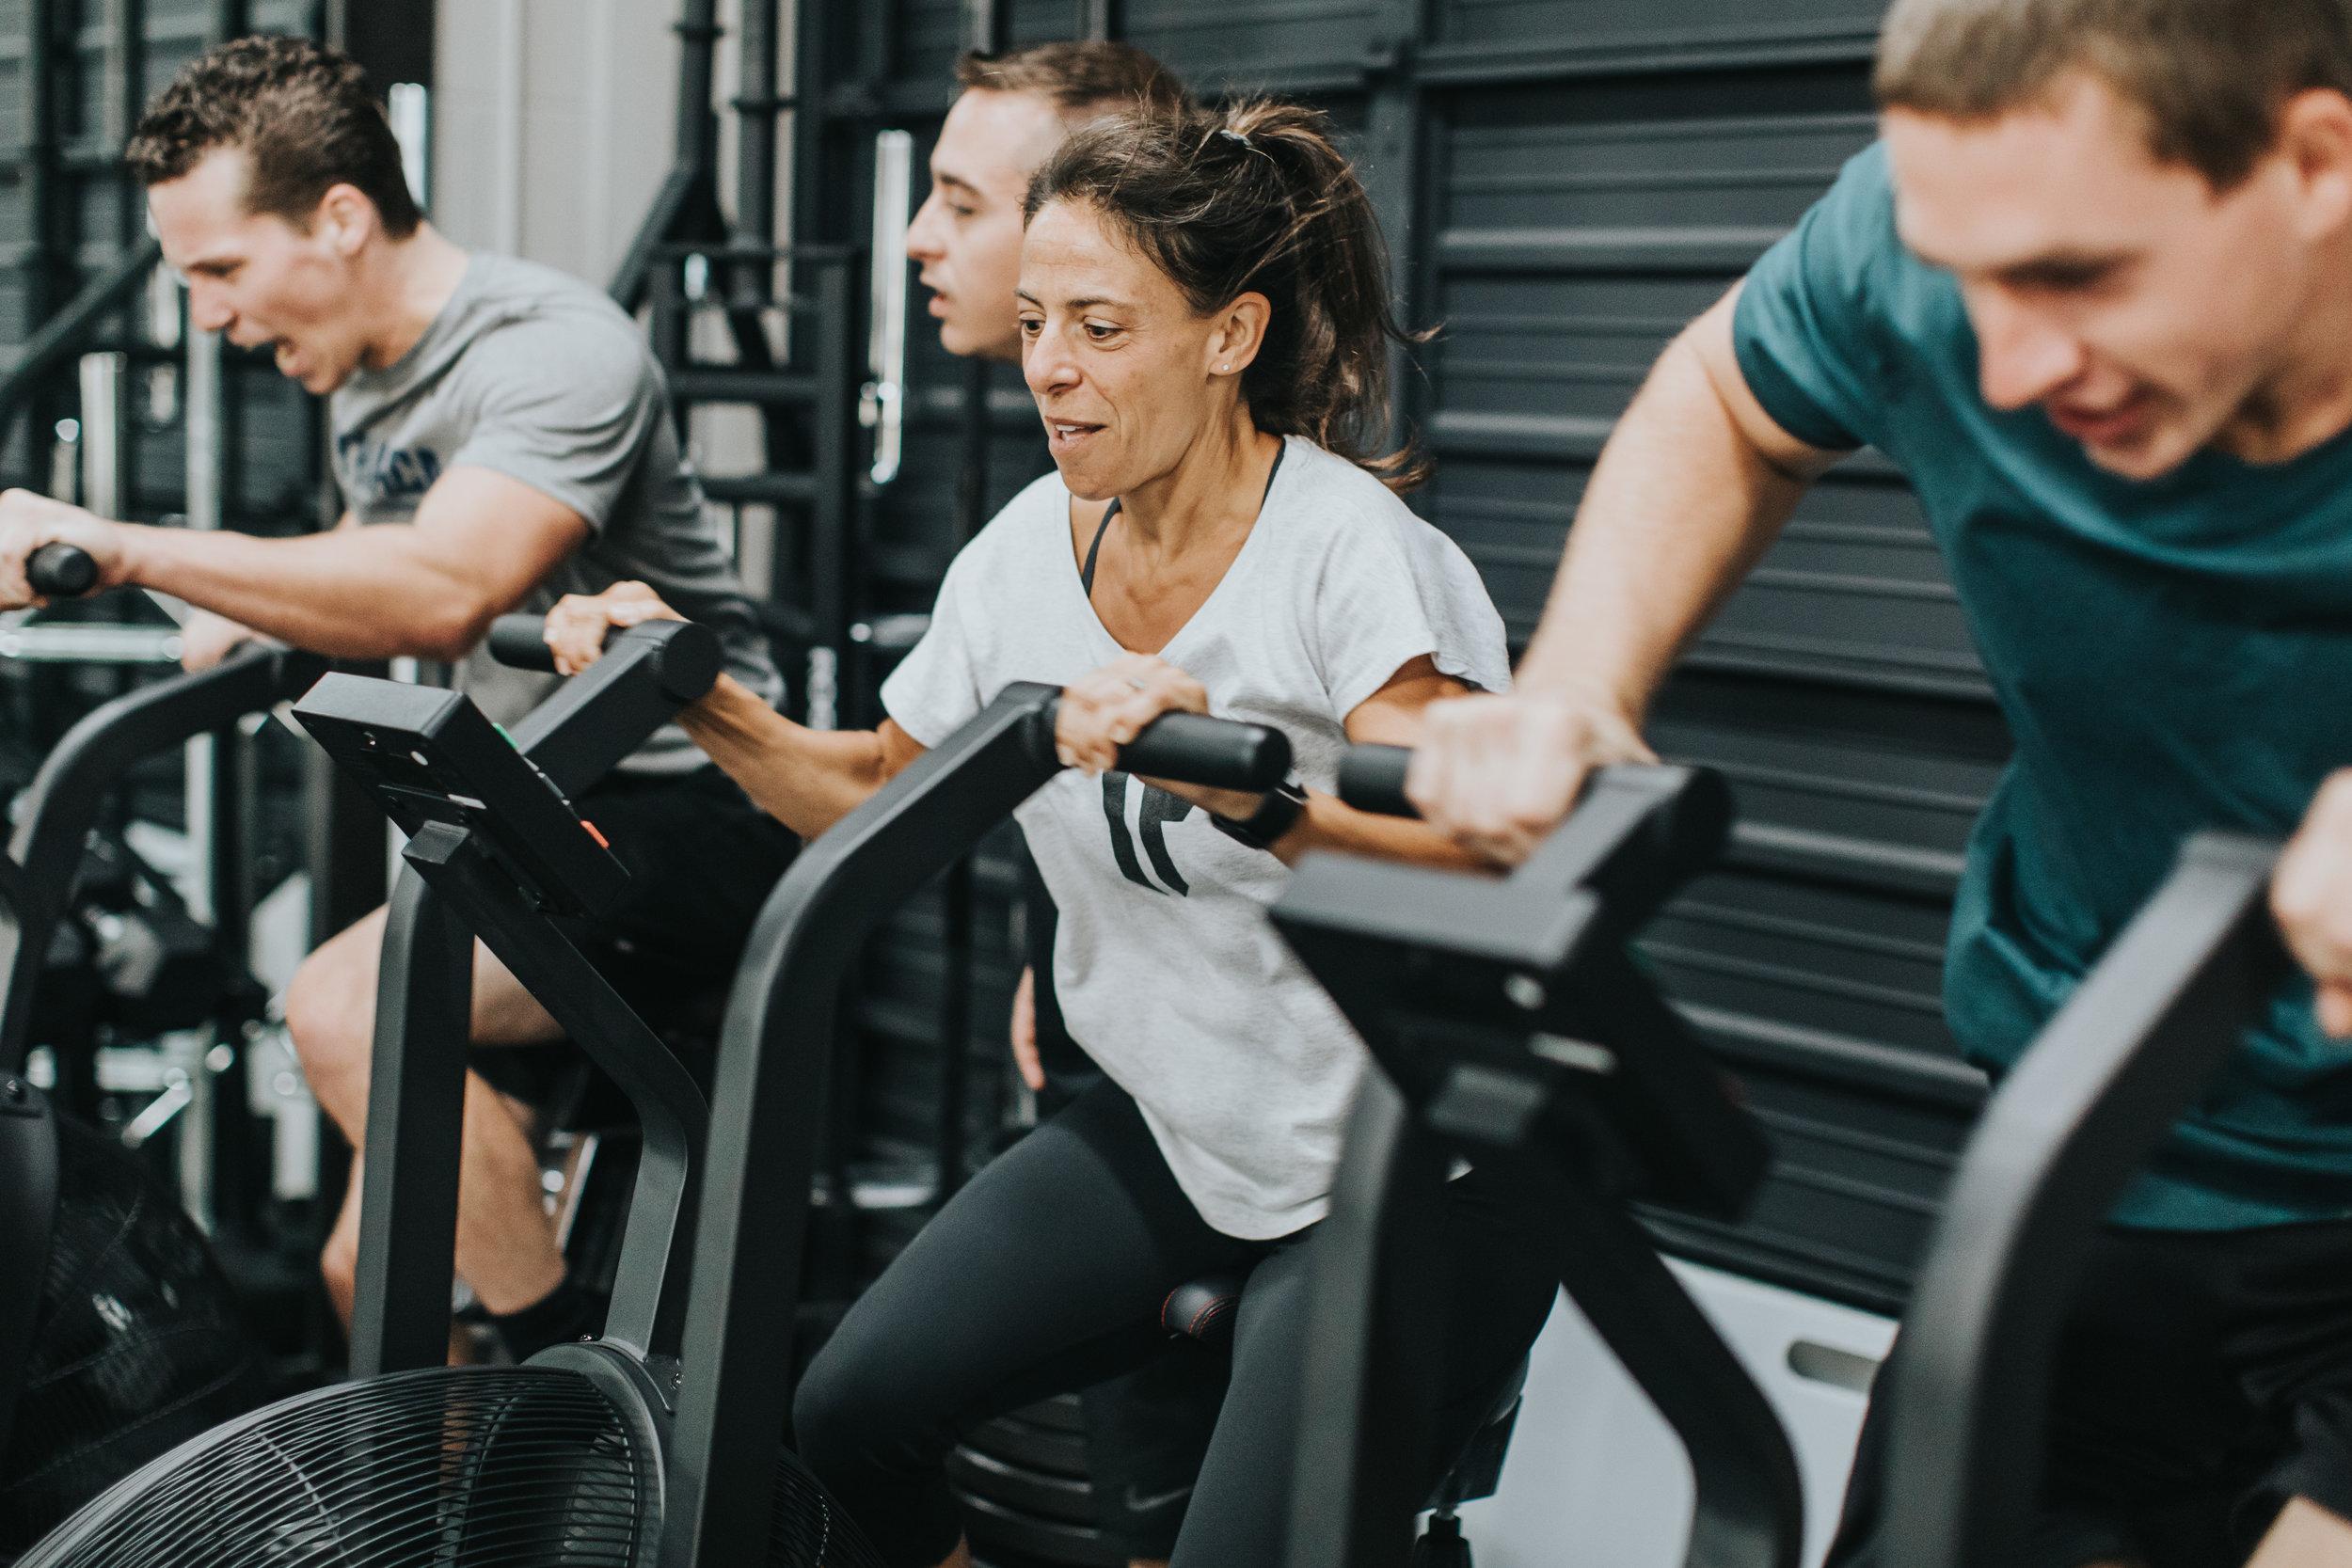 Thrive-Gym-Preview-46.jpg